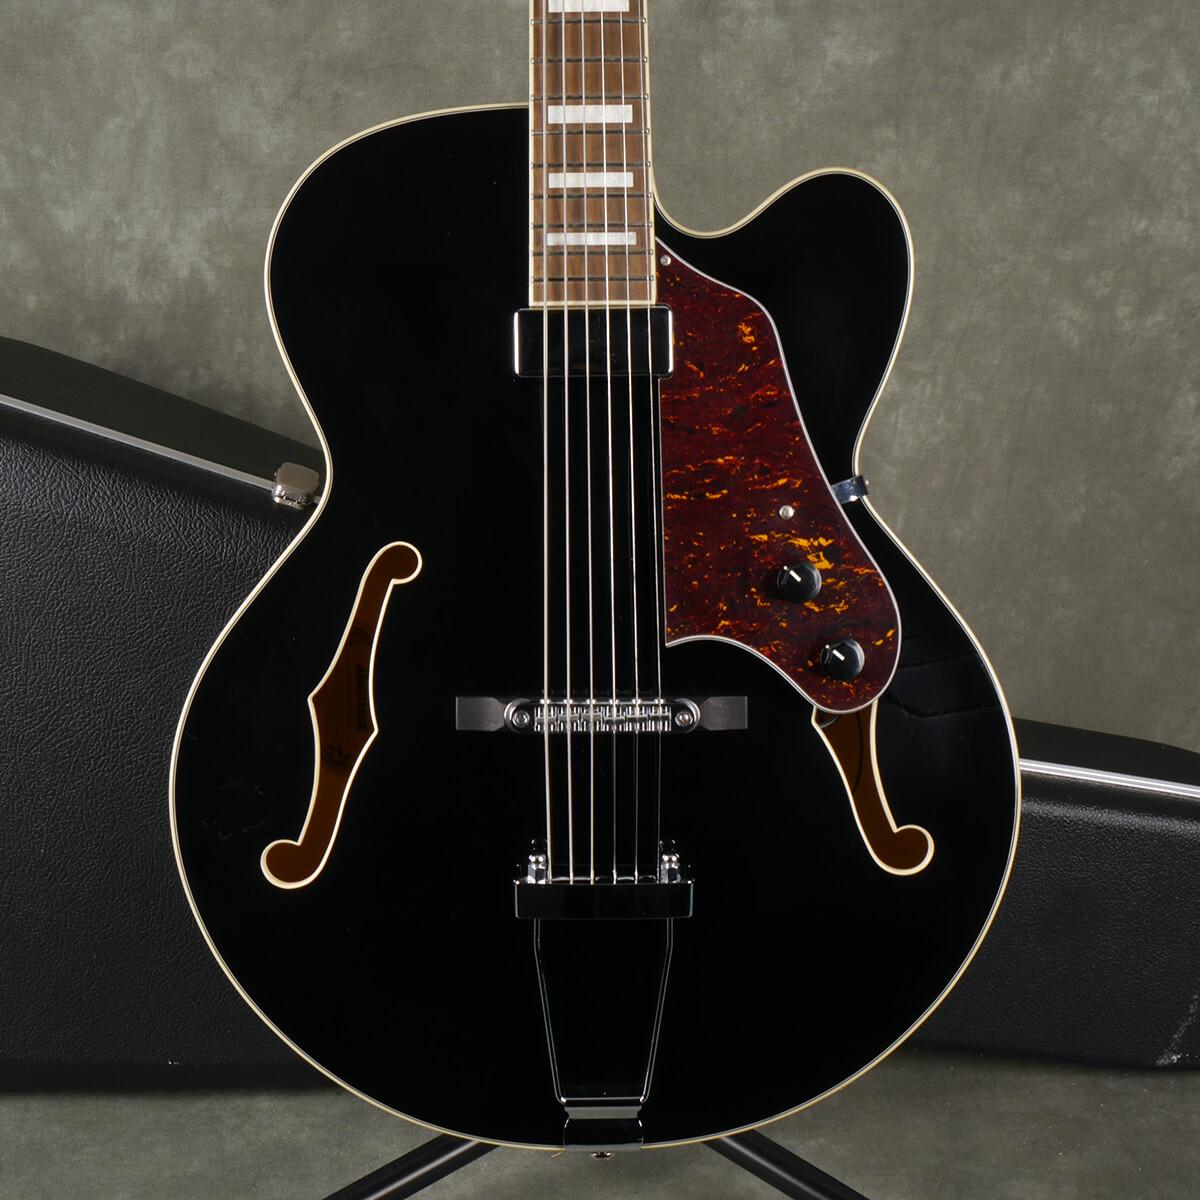 Ibanez FA71 Jazz Guitar - Black w/Hard Case - 2nd Hand